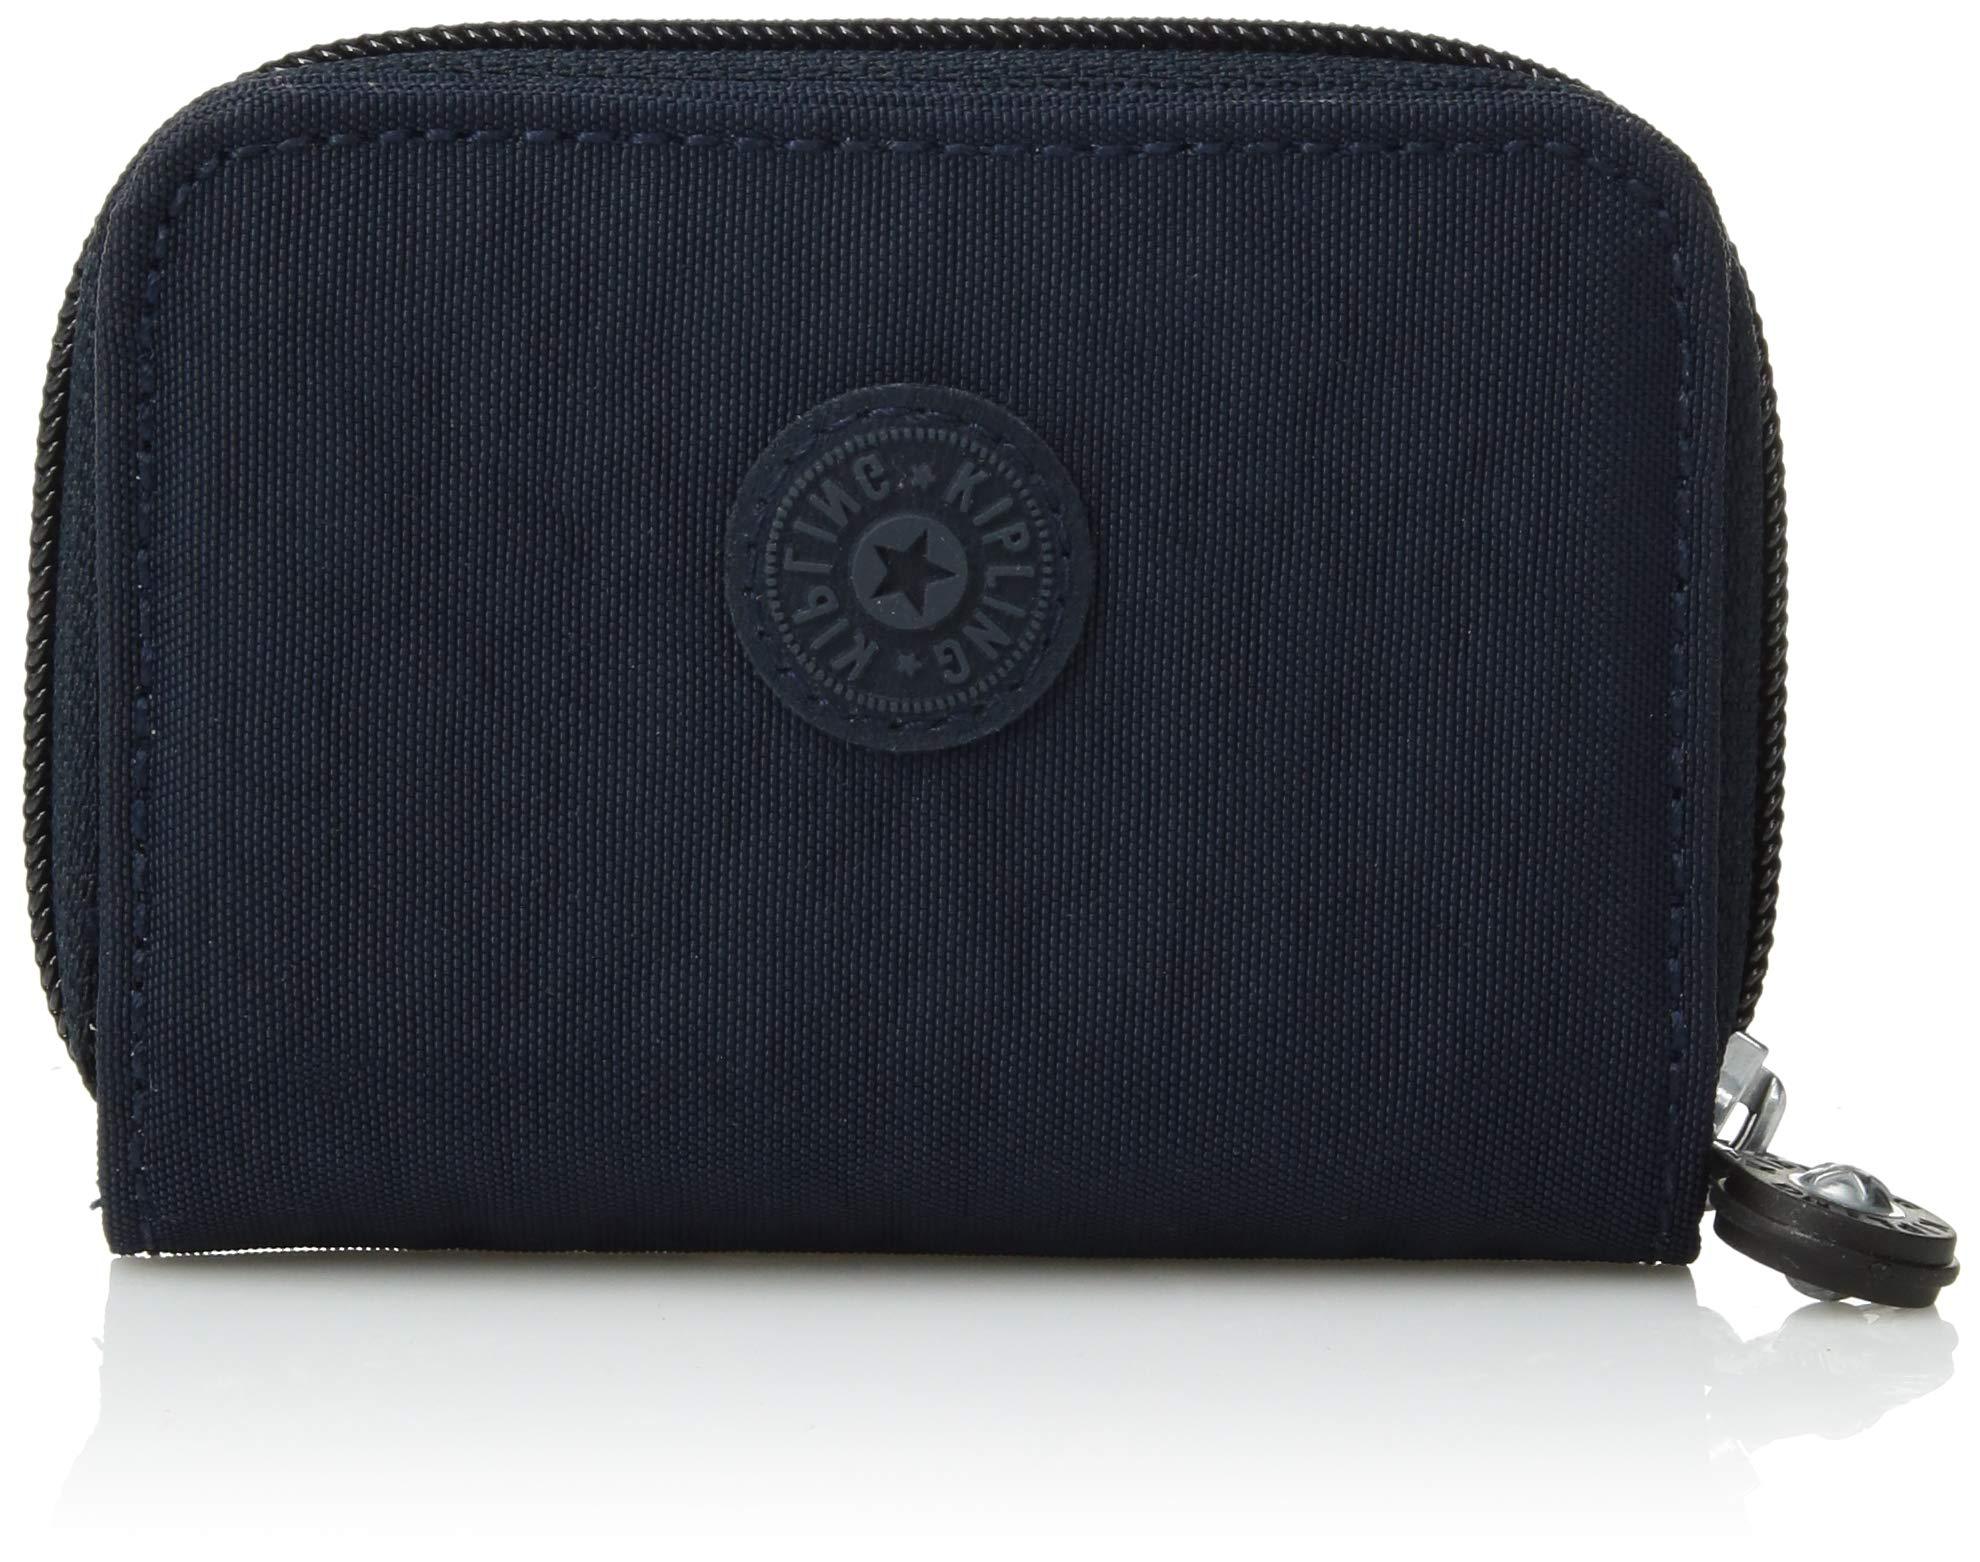 Kipling Tops Wallet, True Blue